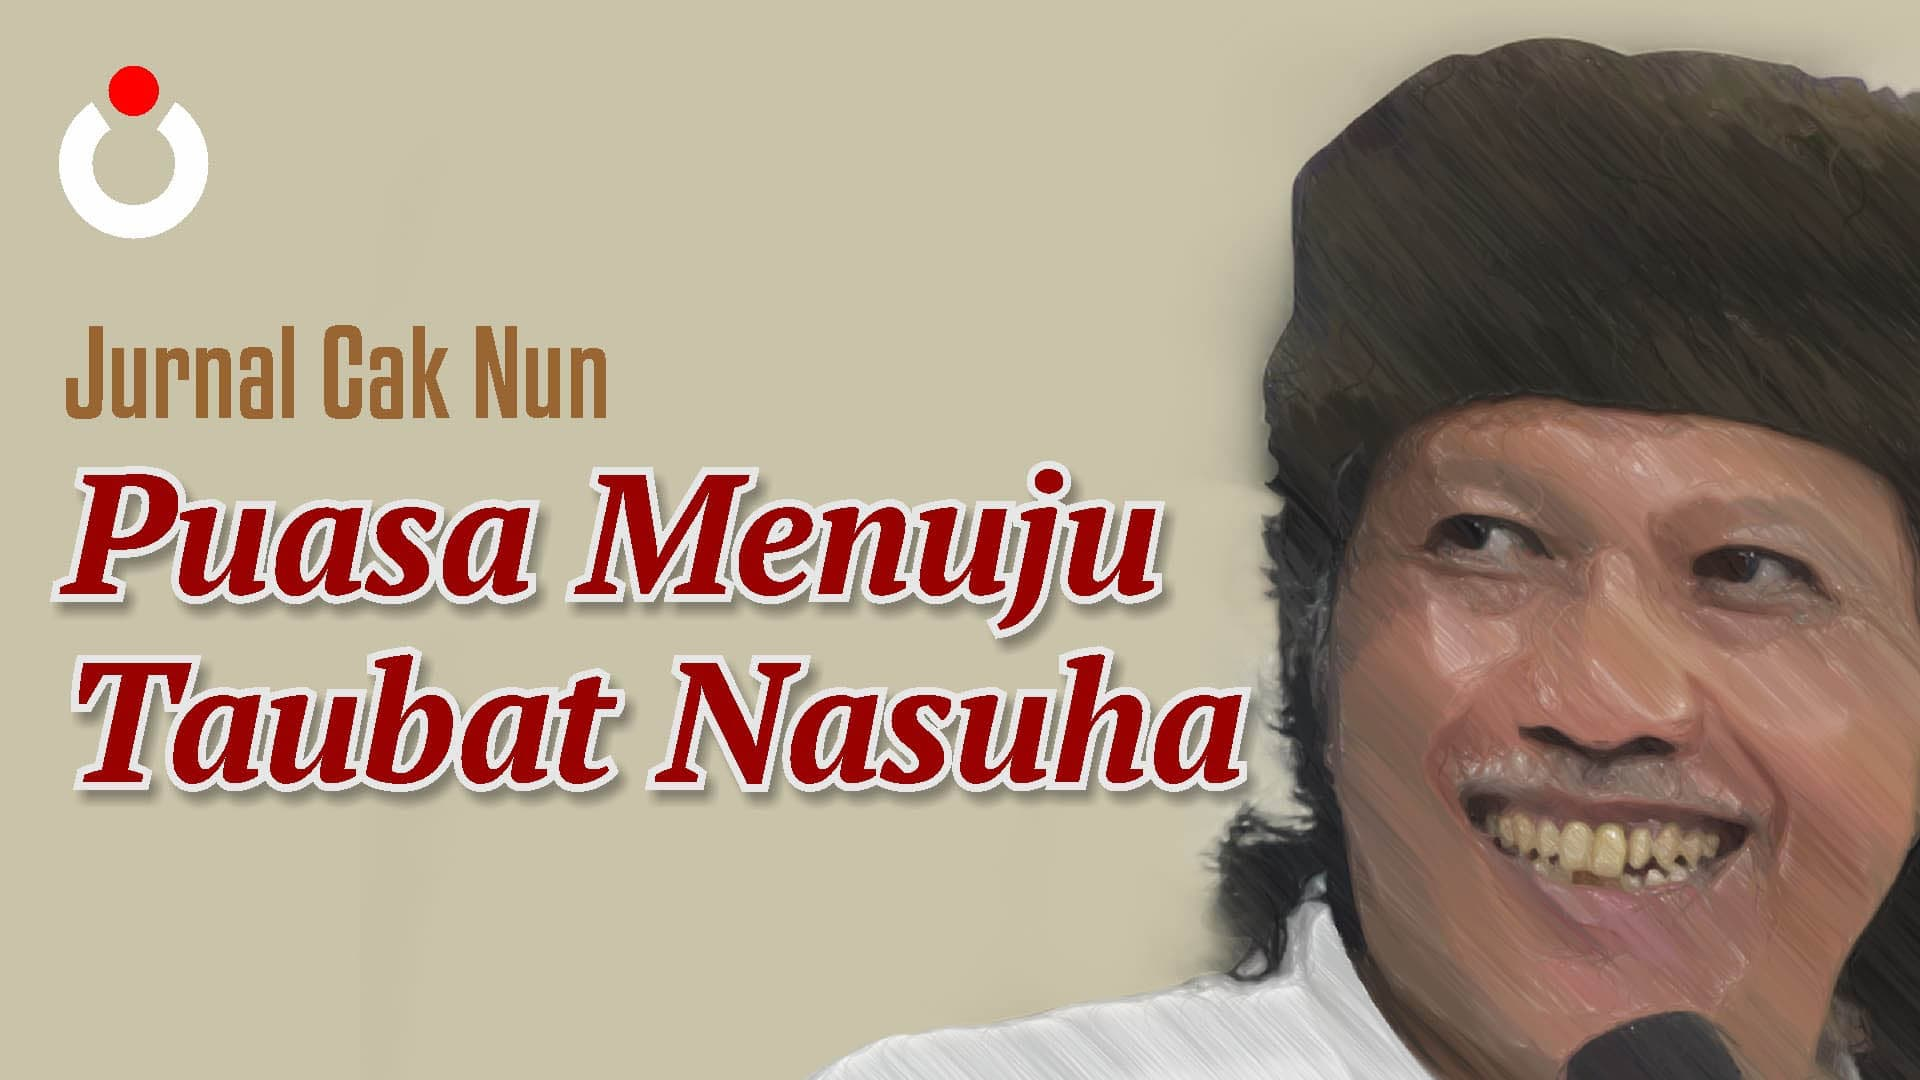 Jurnal Cak Nun – Puasa Menuju Taubat Nasuha